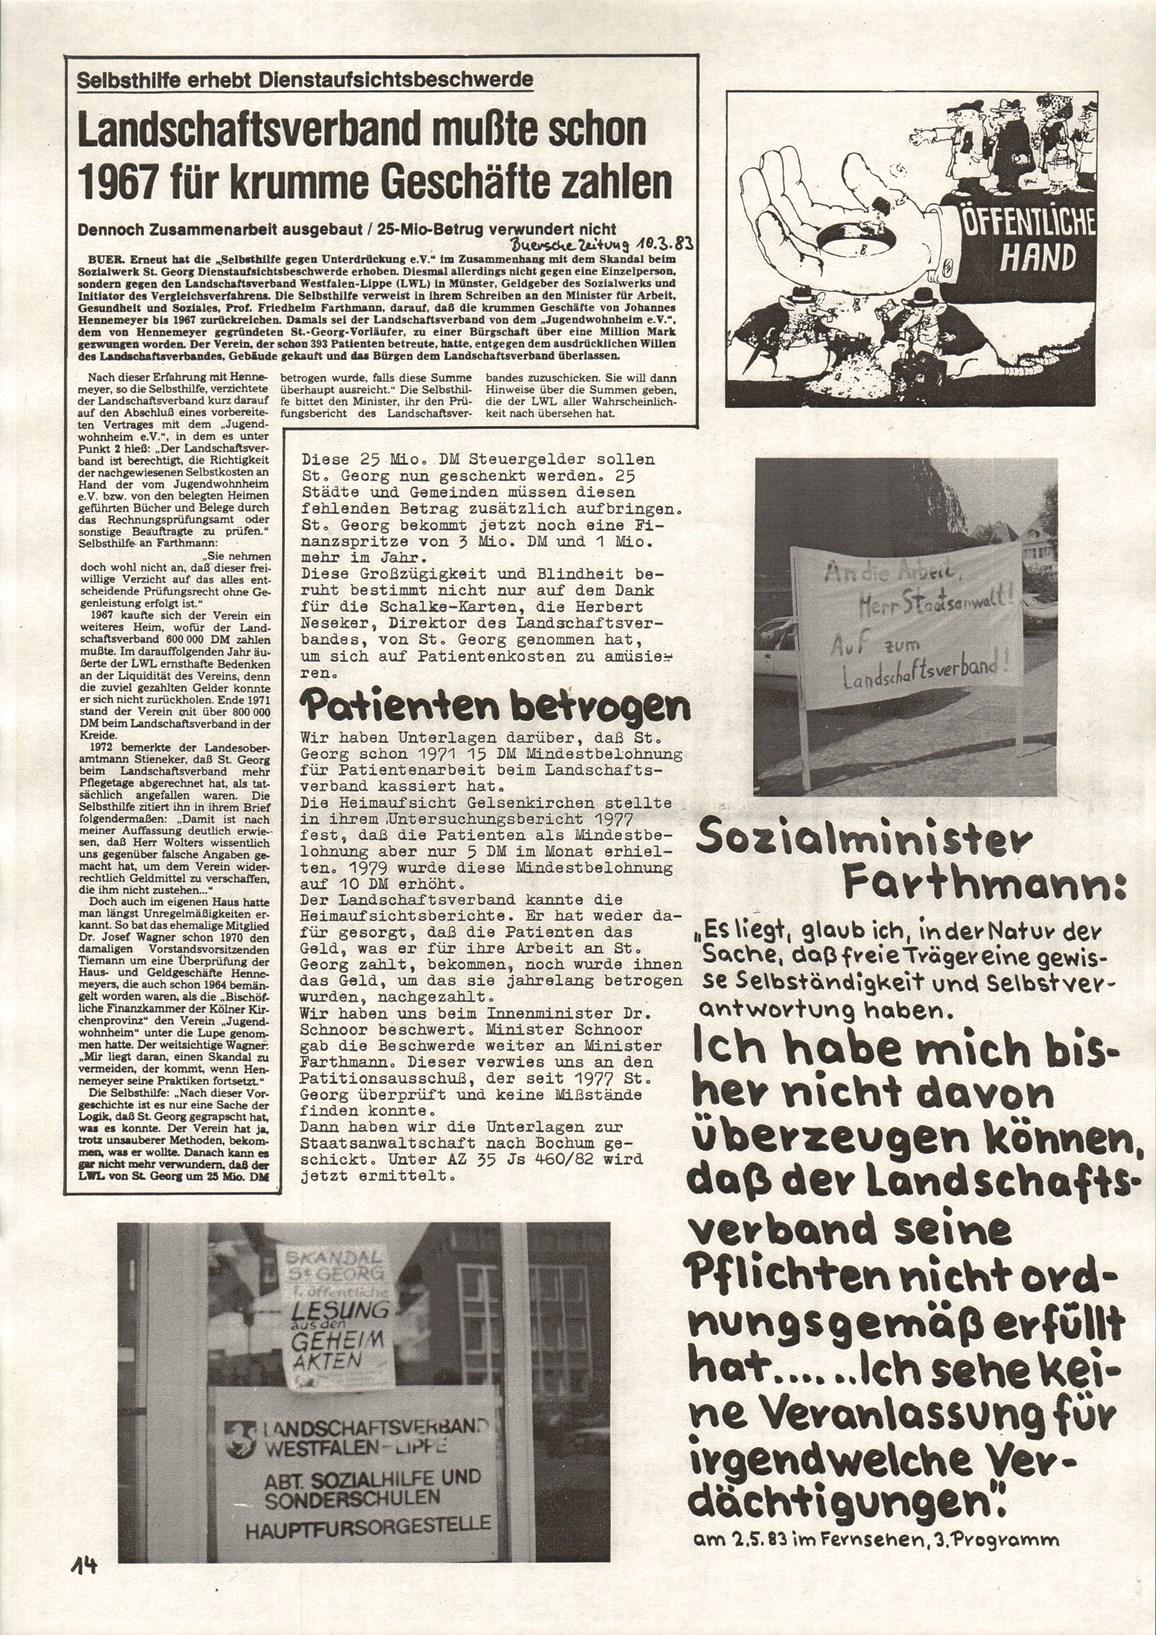 Gelsenkirchen_Selbsthilfe_Blatt_1983_02_14